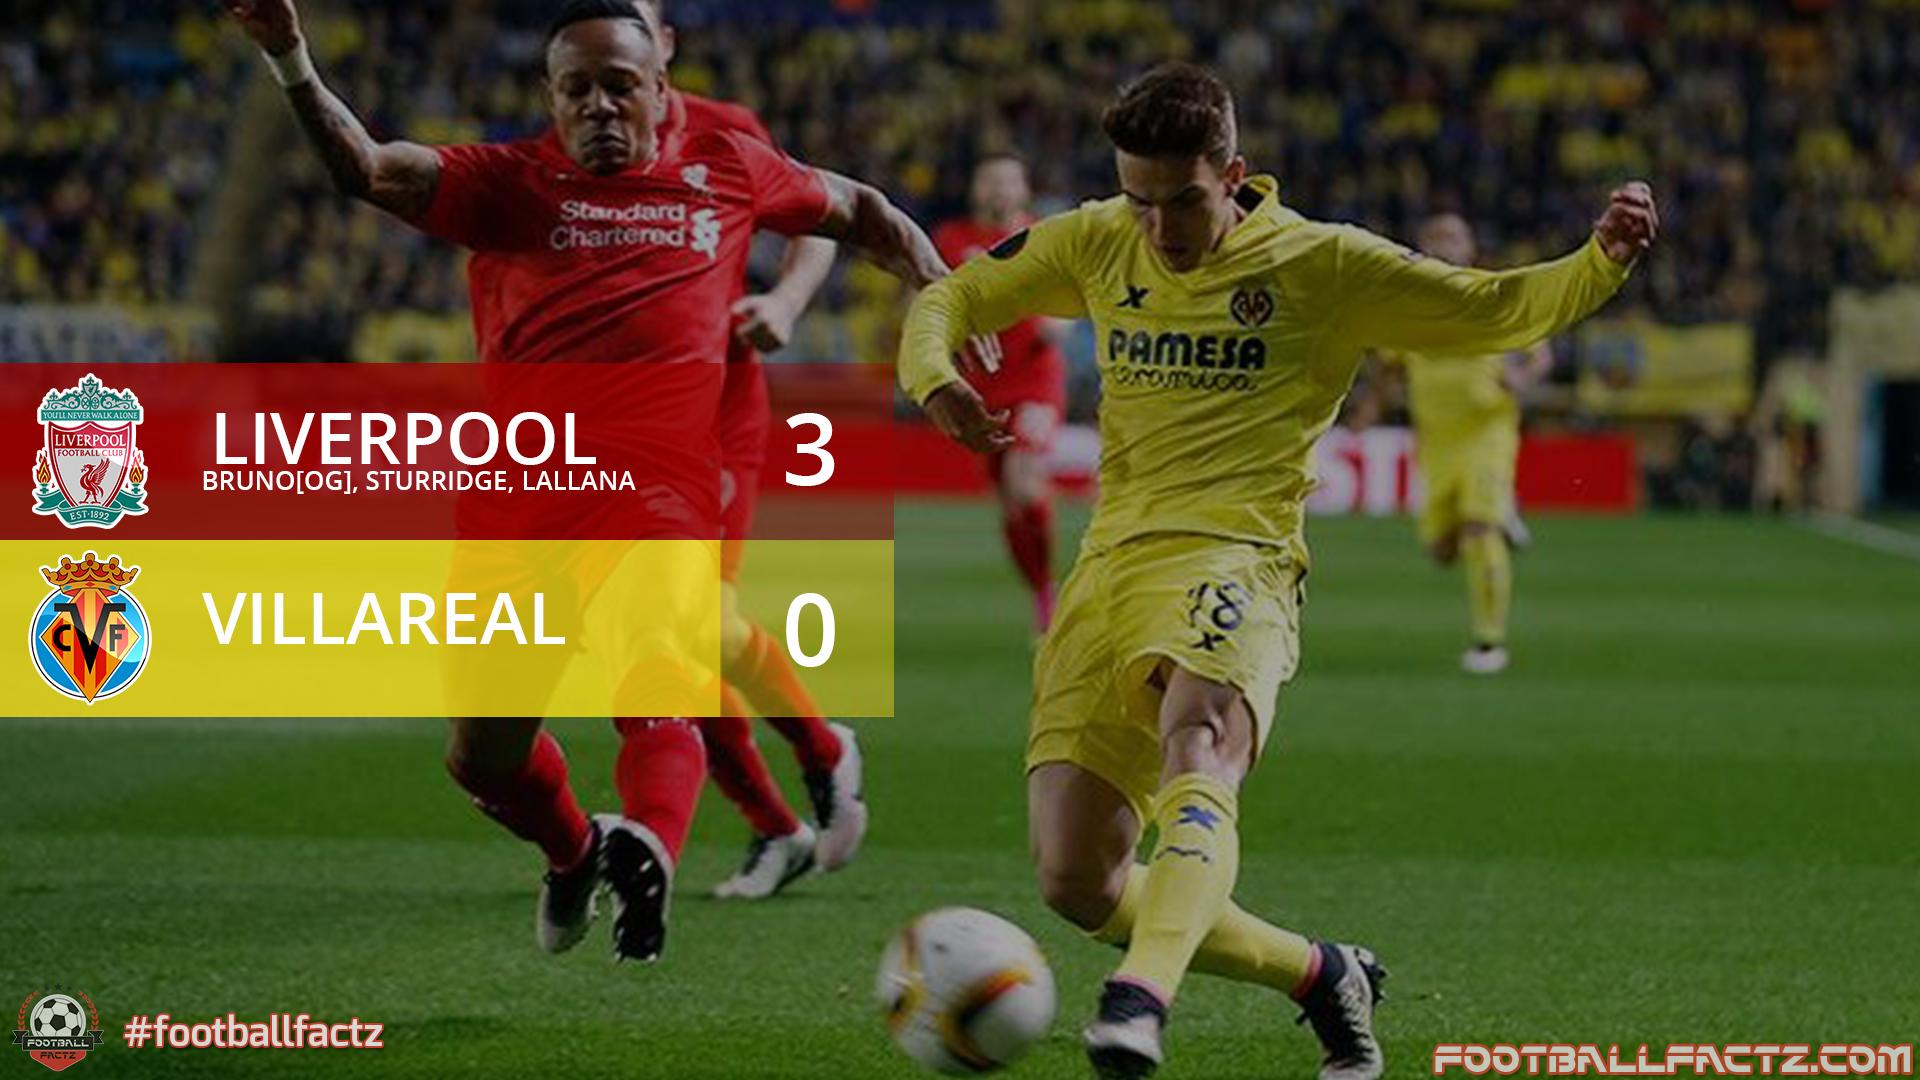 Liverpool 3 - 0 Villarreal, Europa League